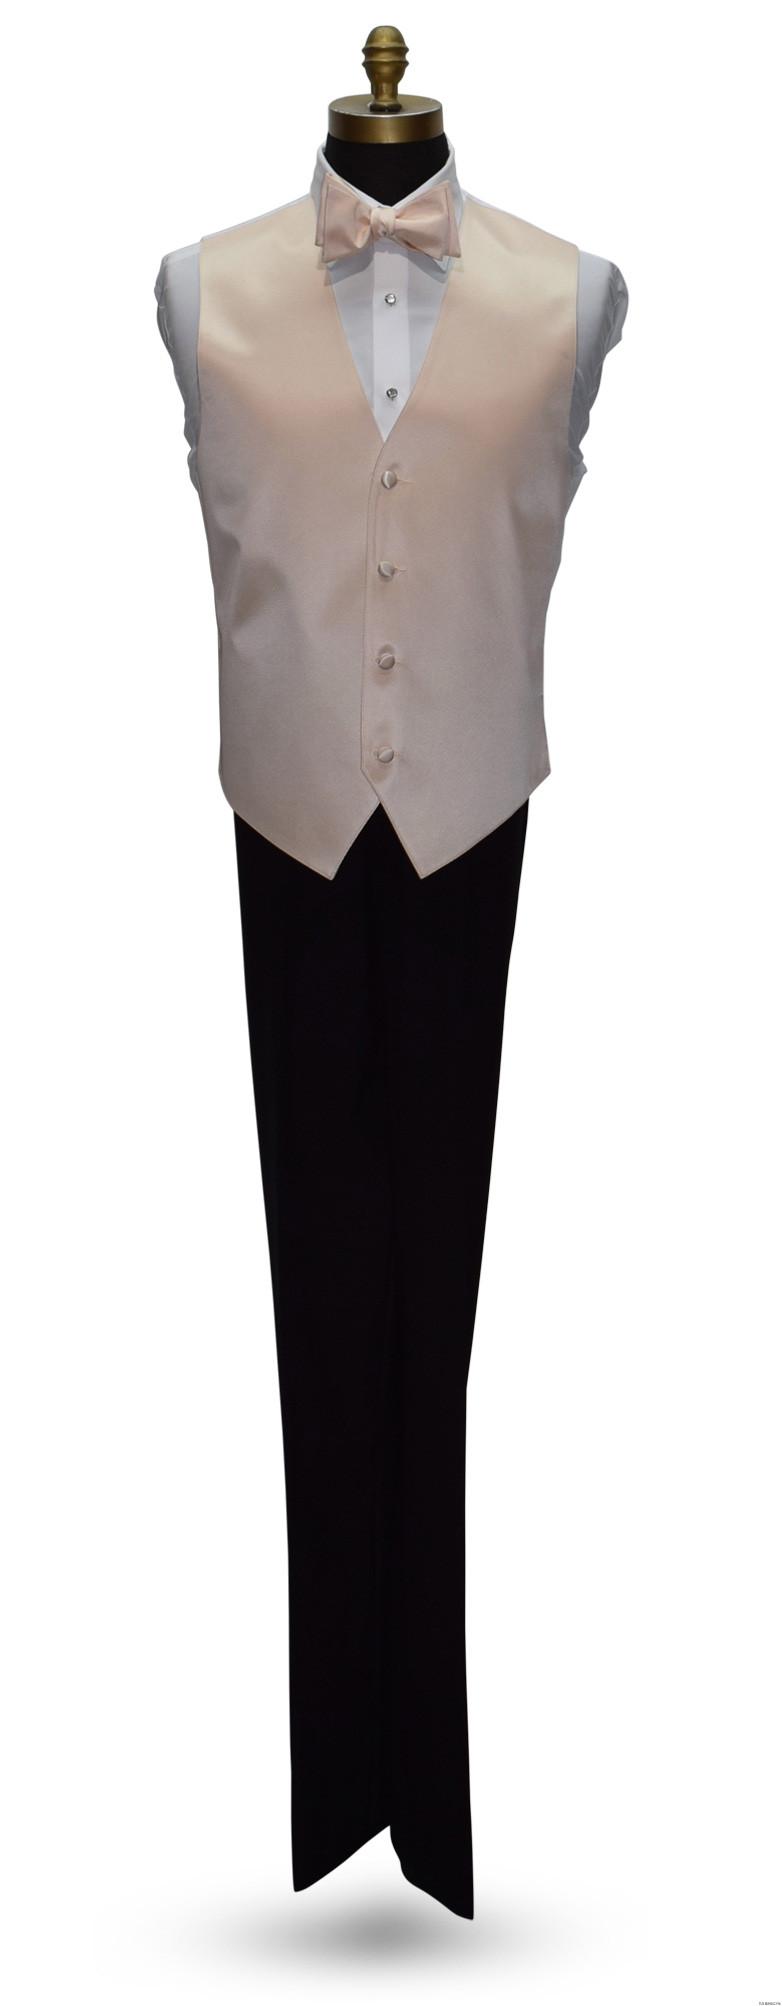 men's nude tuxedo vest and nude bowtie on tuxbling.com